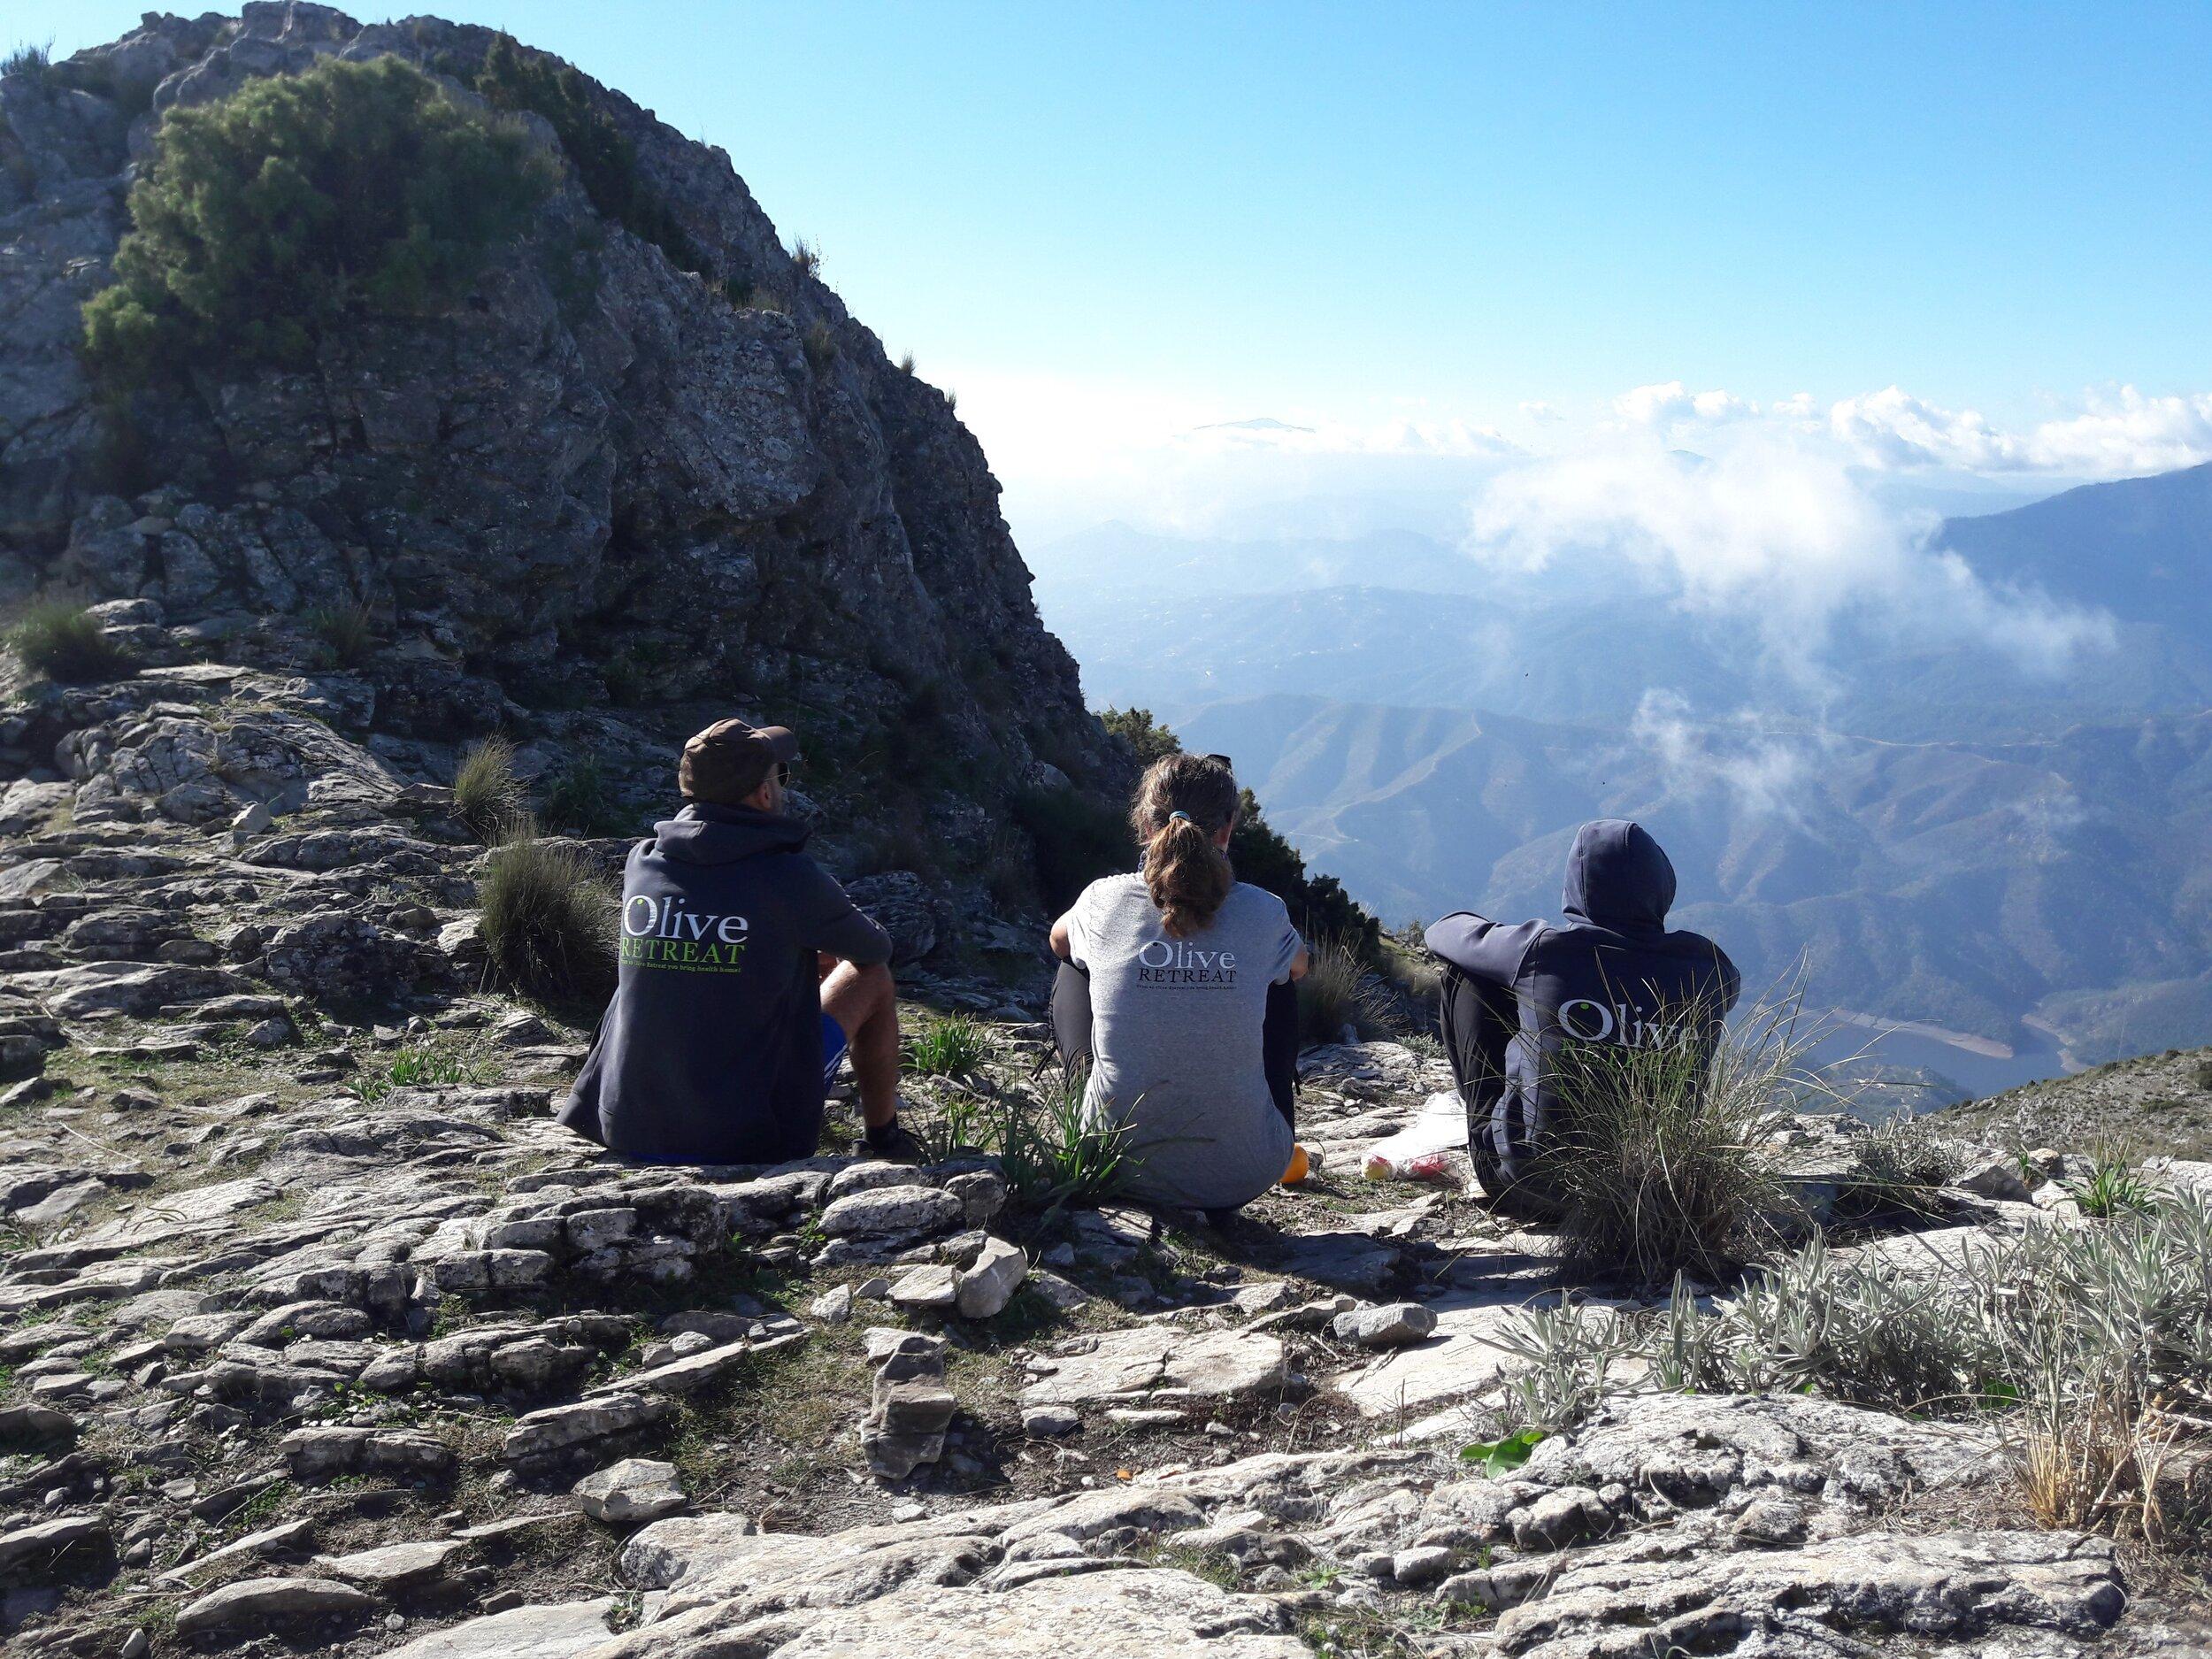 olive retrat mountain meditation.jpg